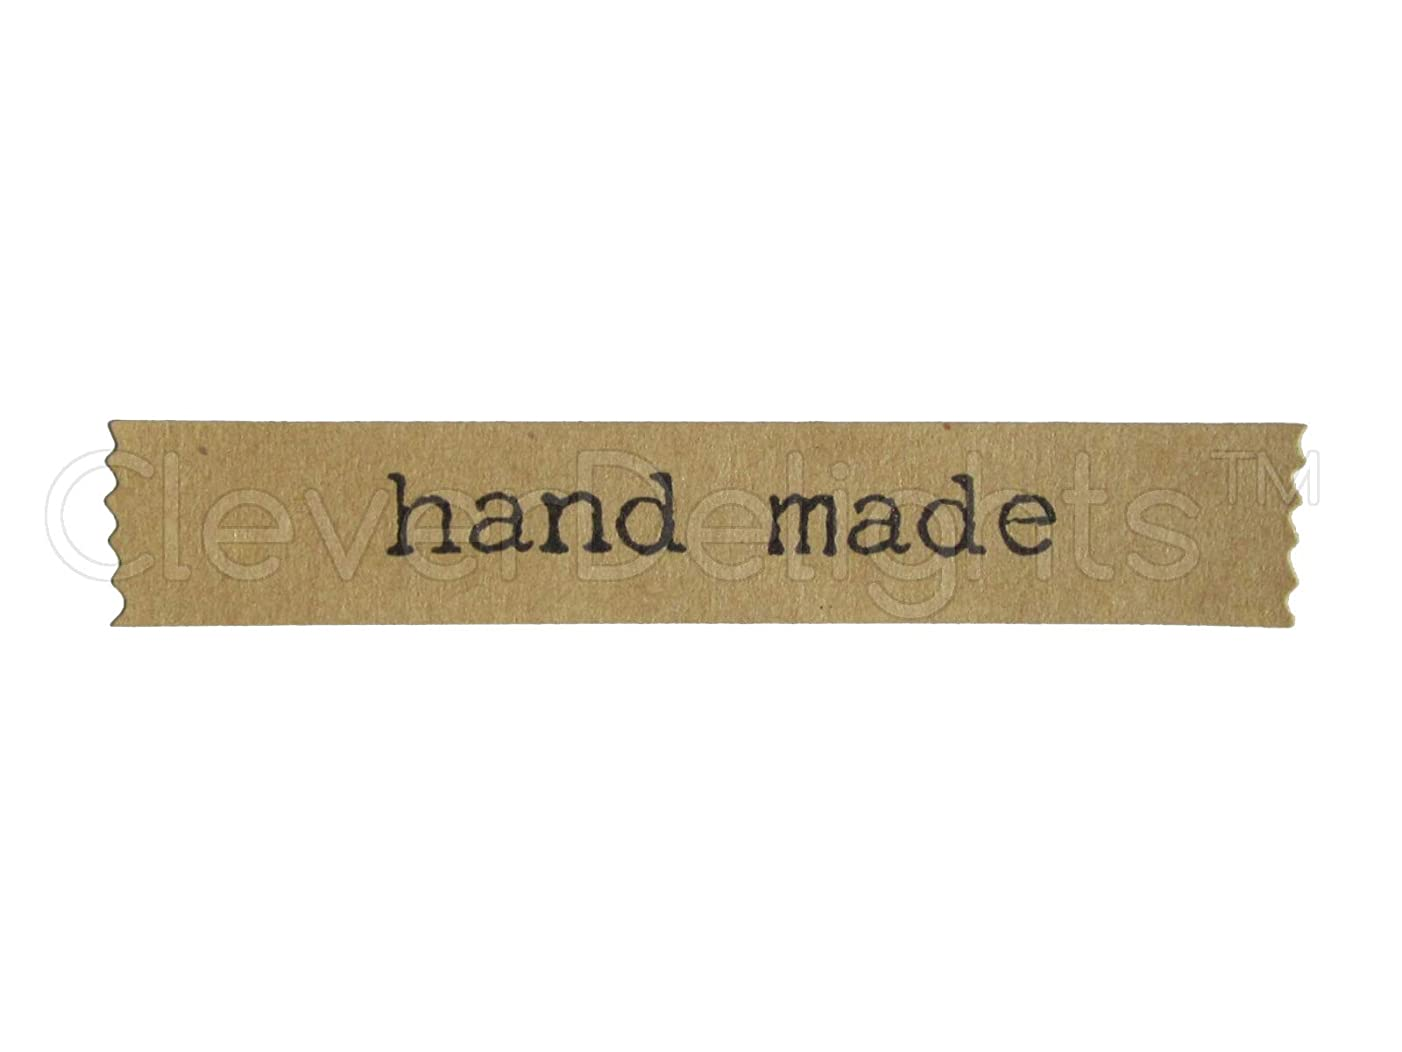 144 Pack - CleverDelights Hand Made Stickers - Kraft Banner Design - Kraft Paper Stickers - 2 3/4